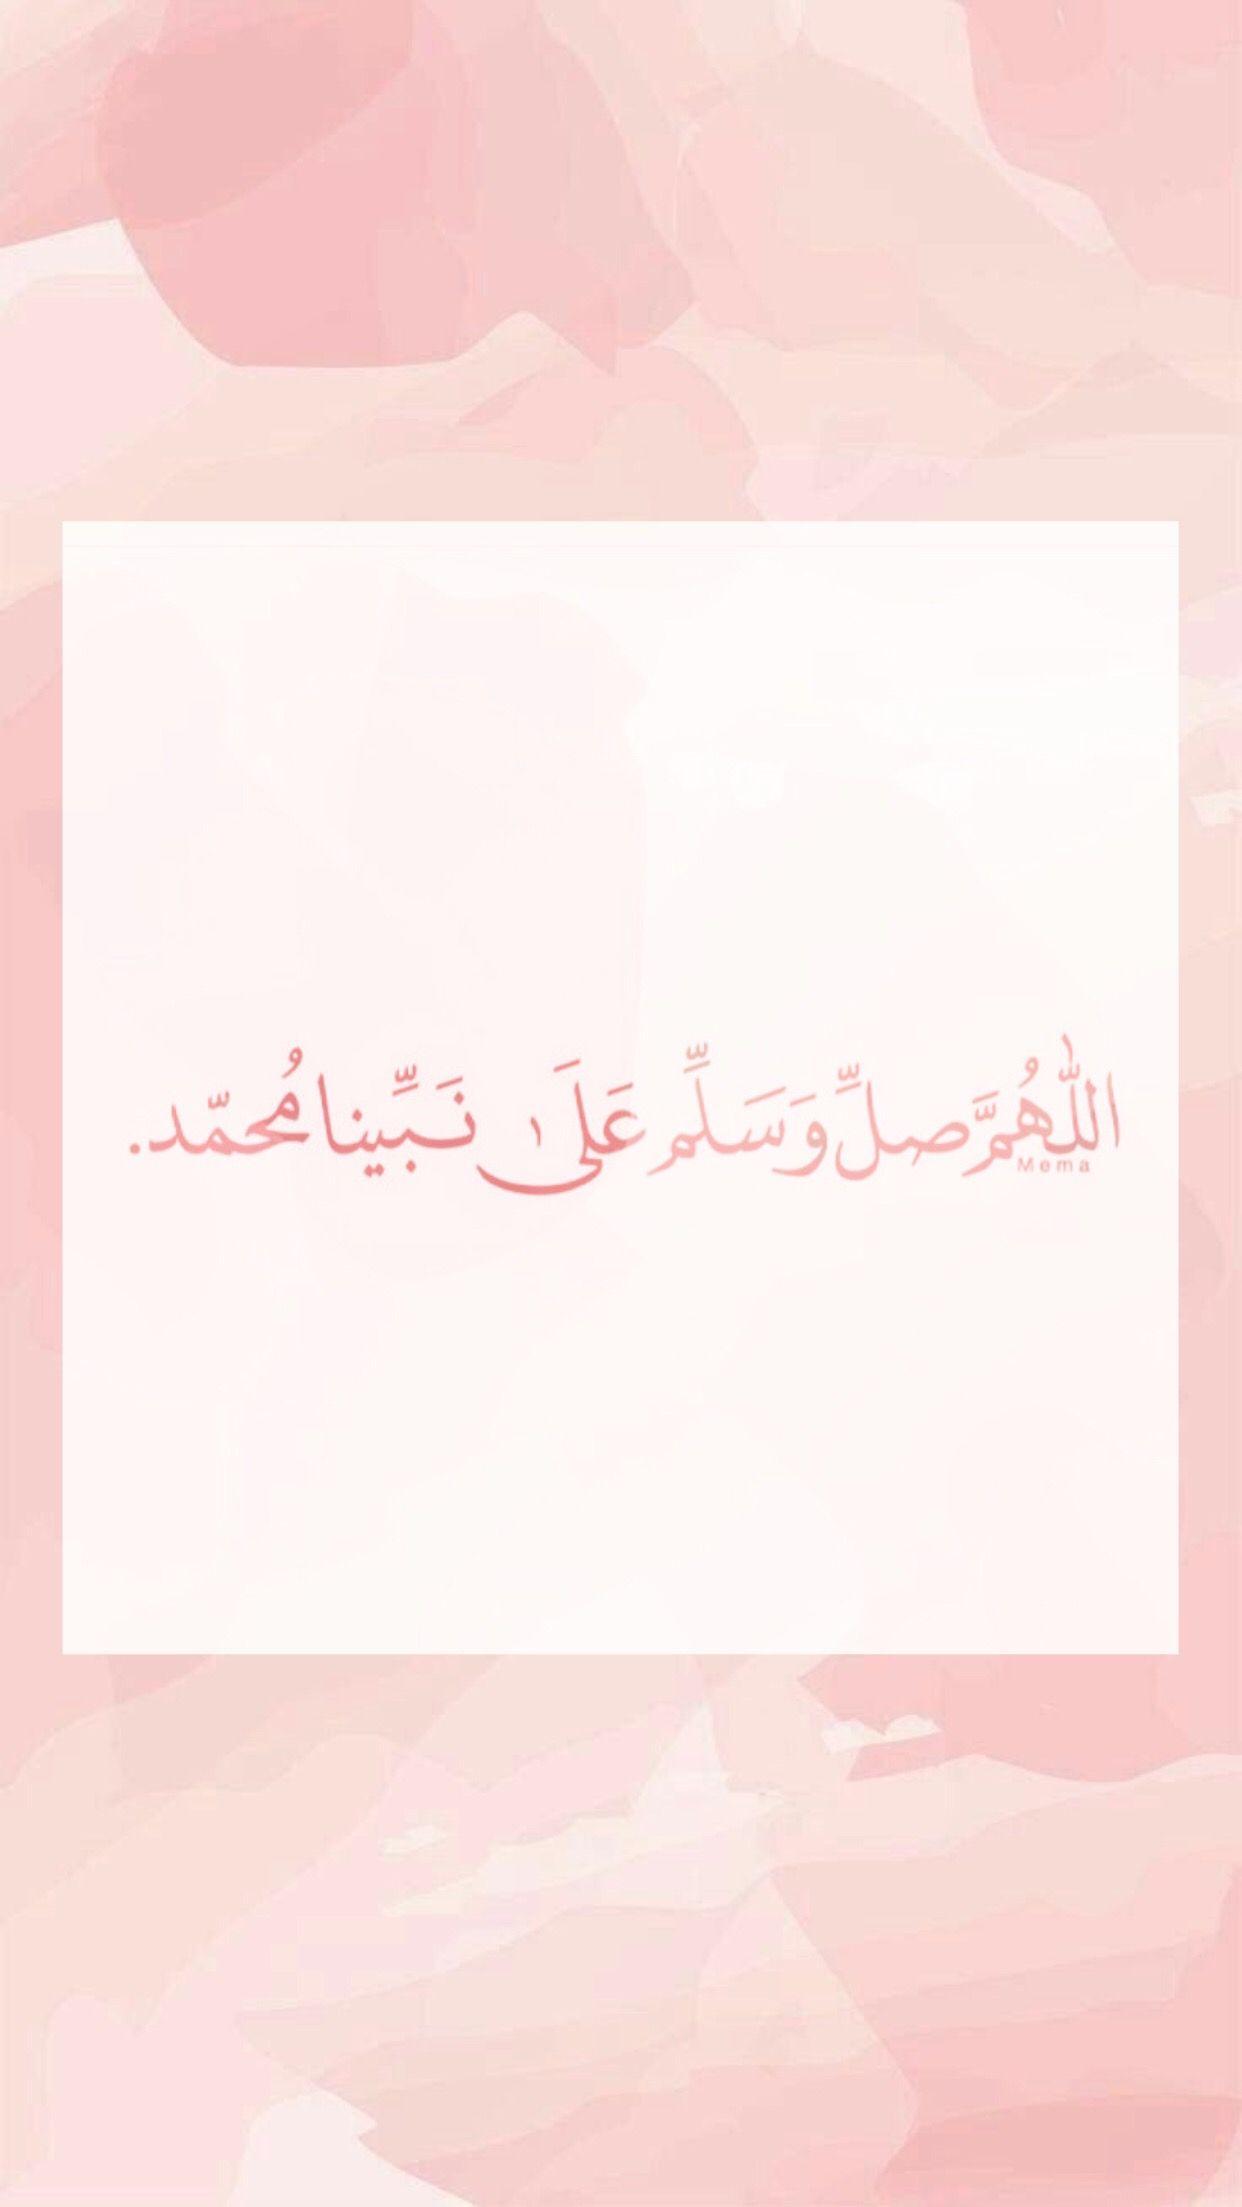 صلو على النبي Quran Quotes Love Iphone Wallpaper Quotes Love Quran Quotes Inspirational